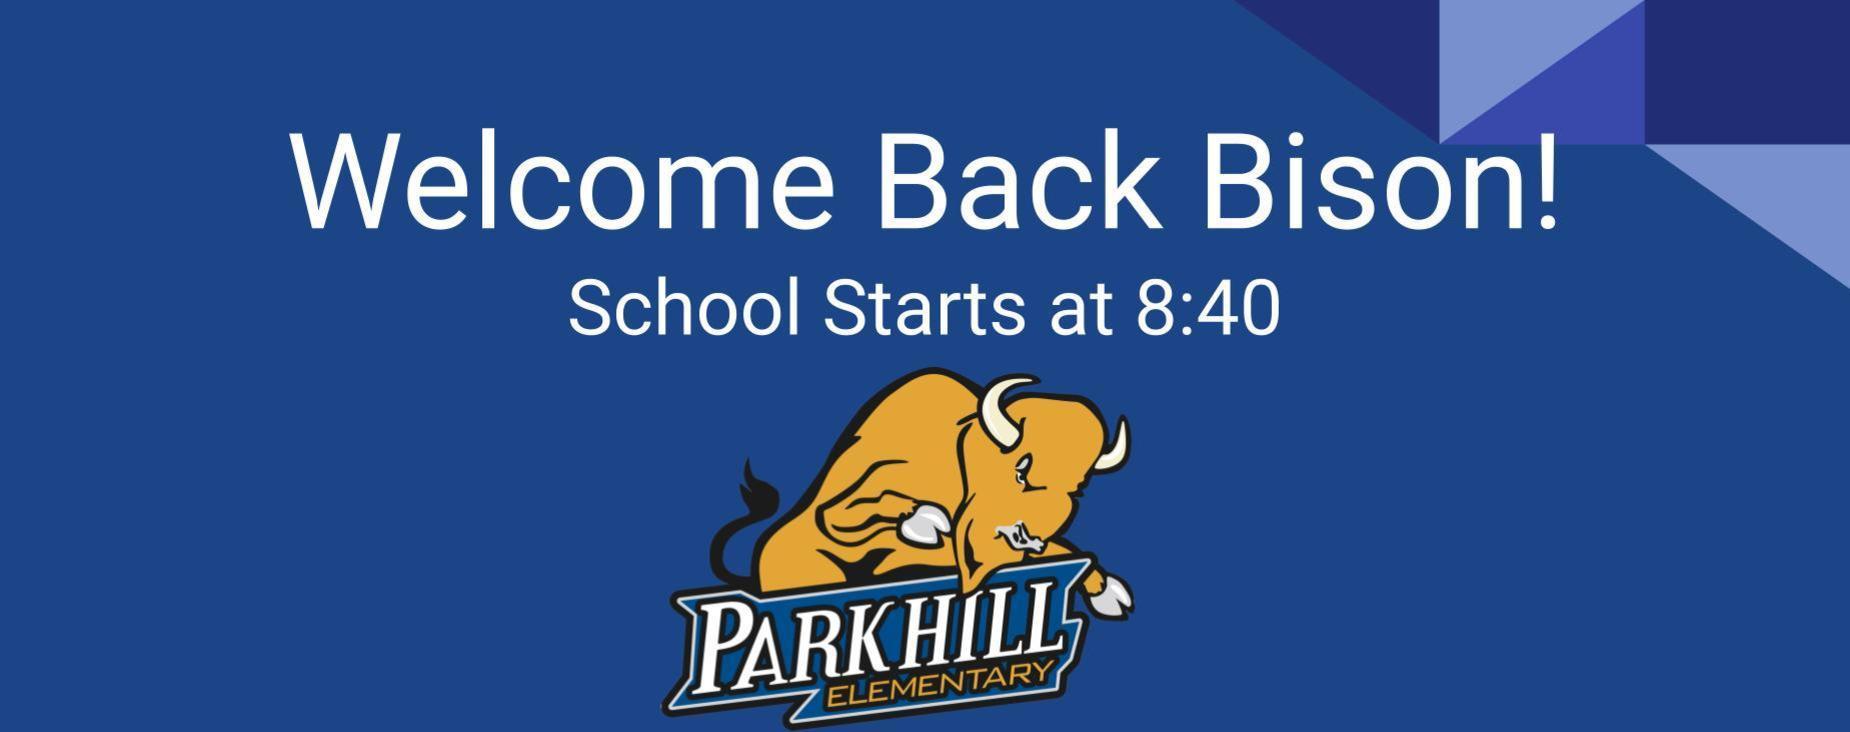 Welcome Back Bison. School starts at 8:40